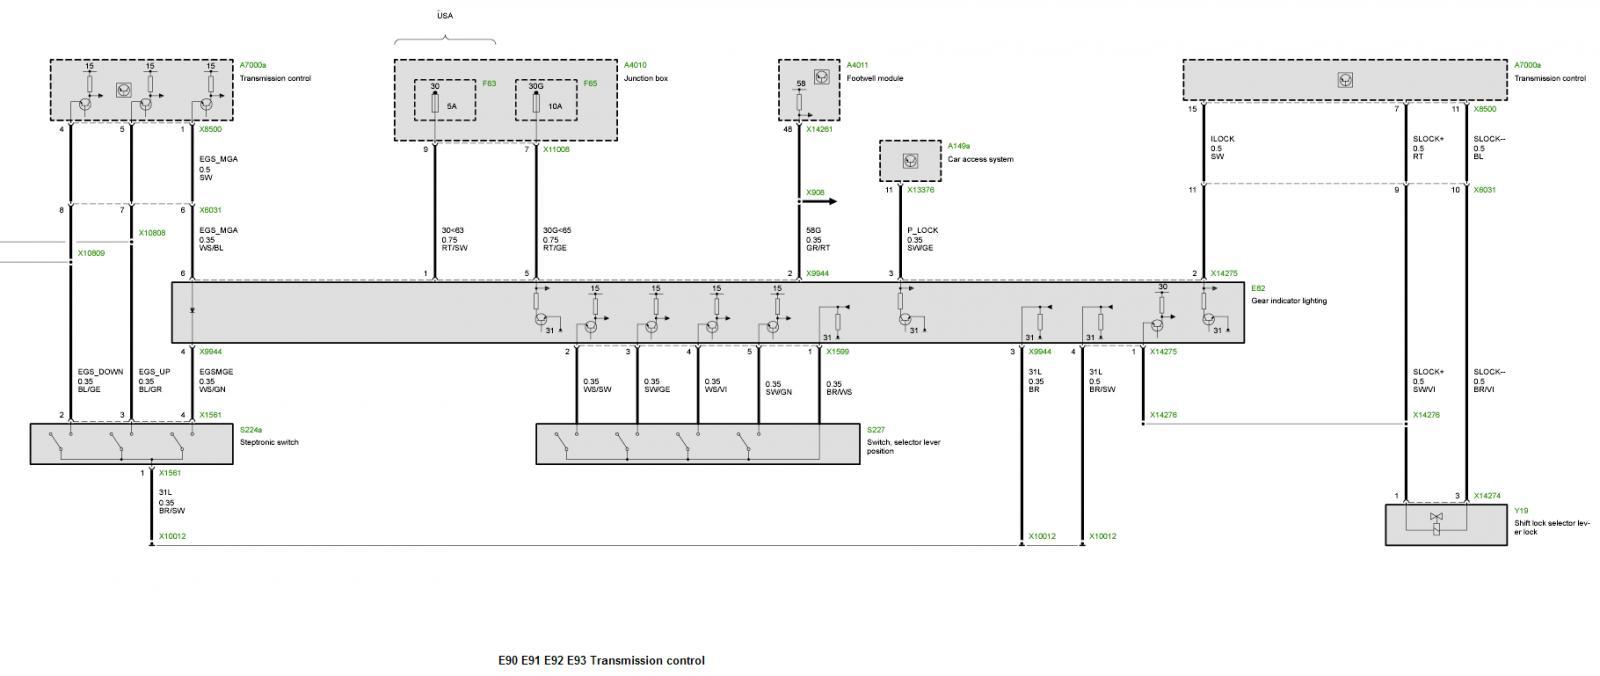 bmw m3 wiring diagram bmw wiring diagrams bmw e92 m3 wiring diagram jodebal com